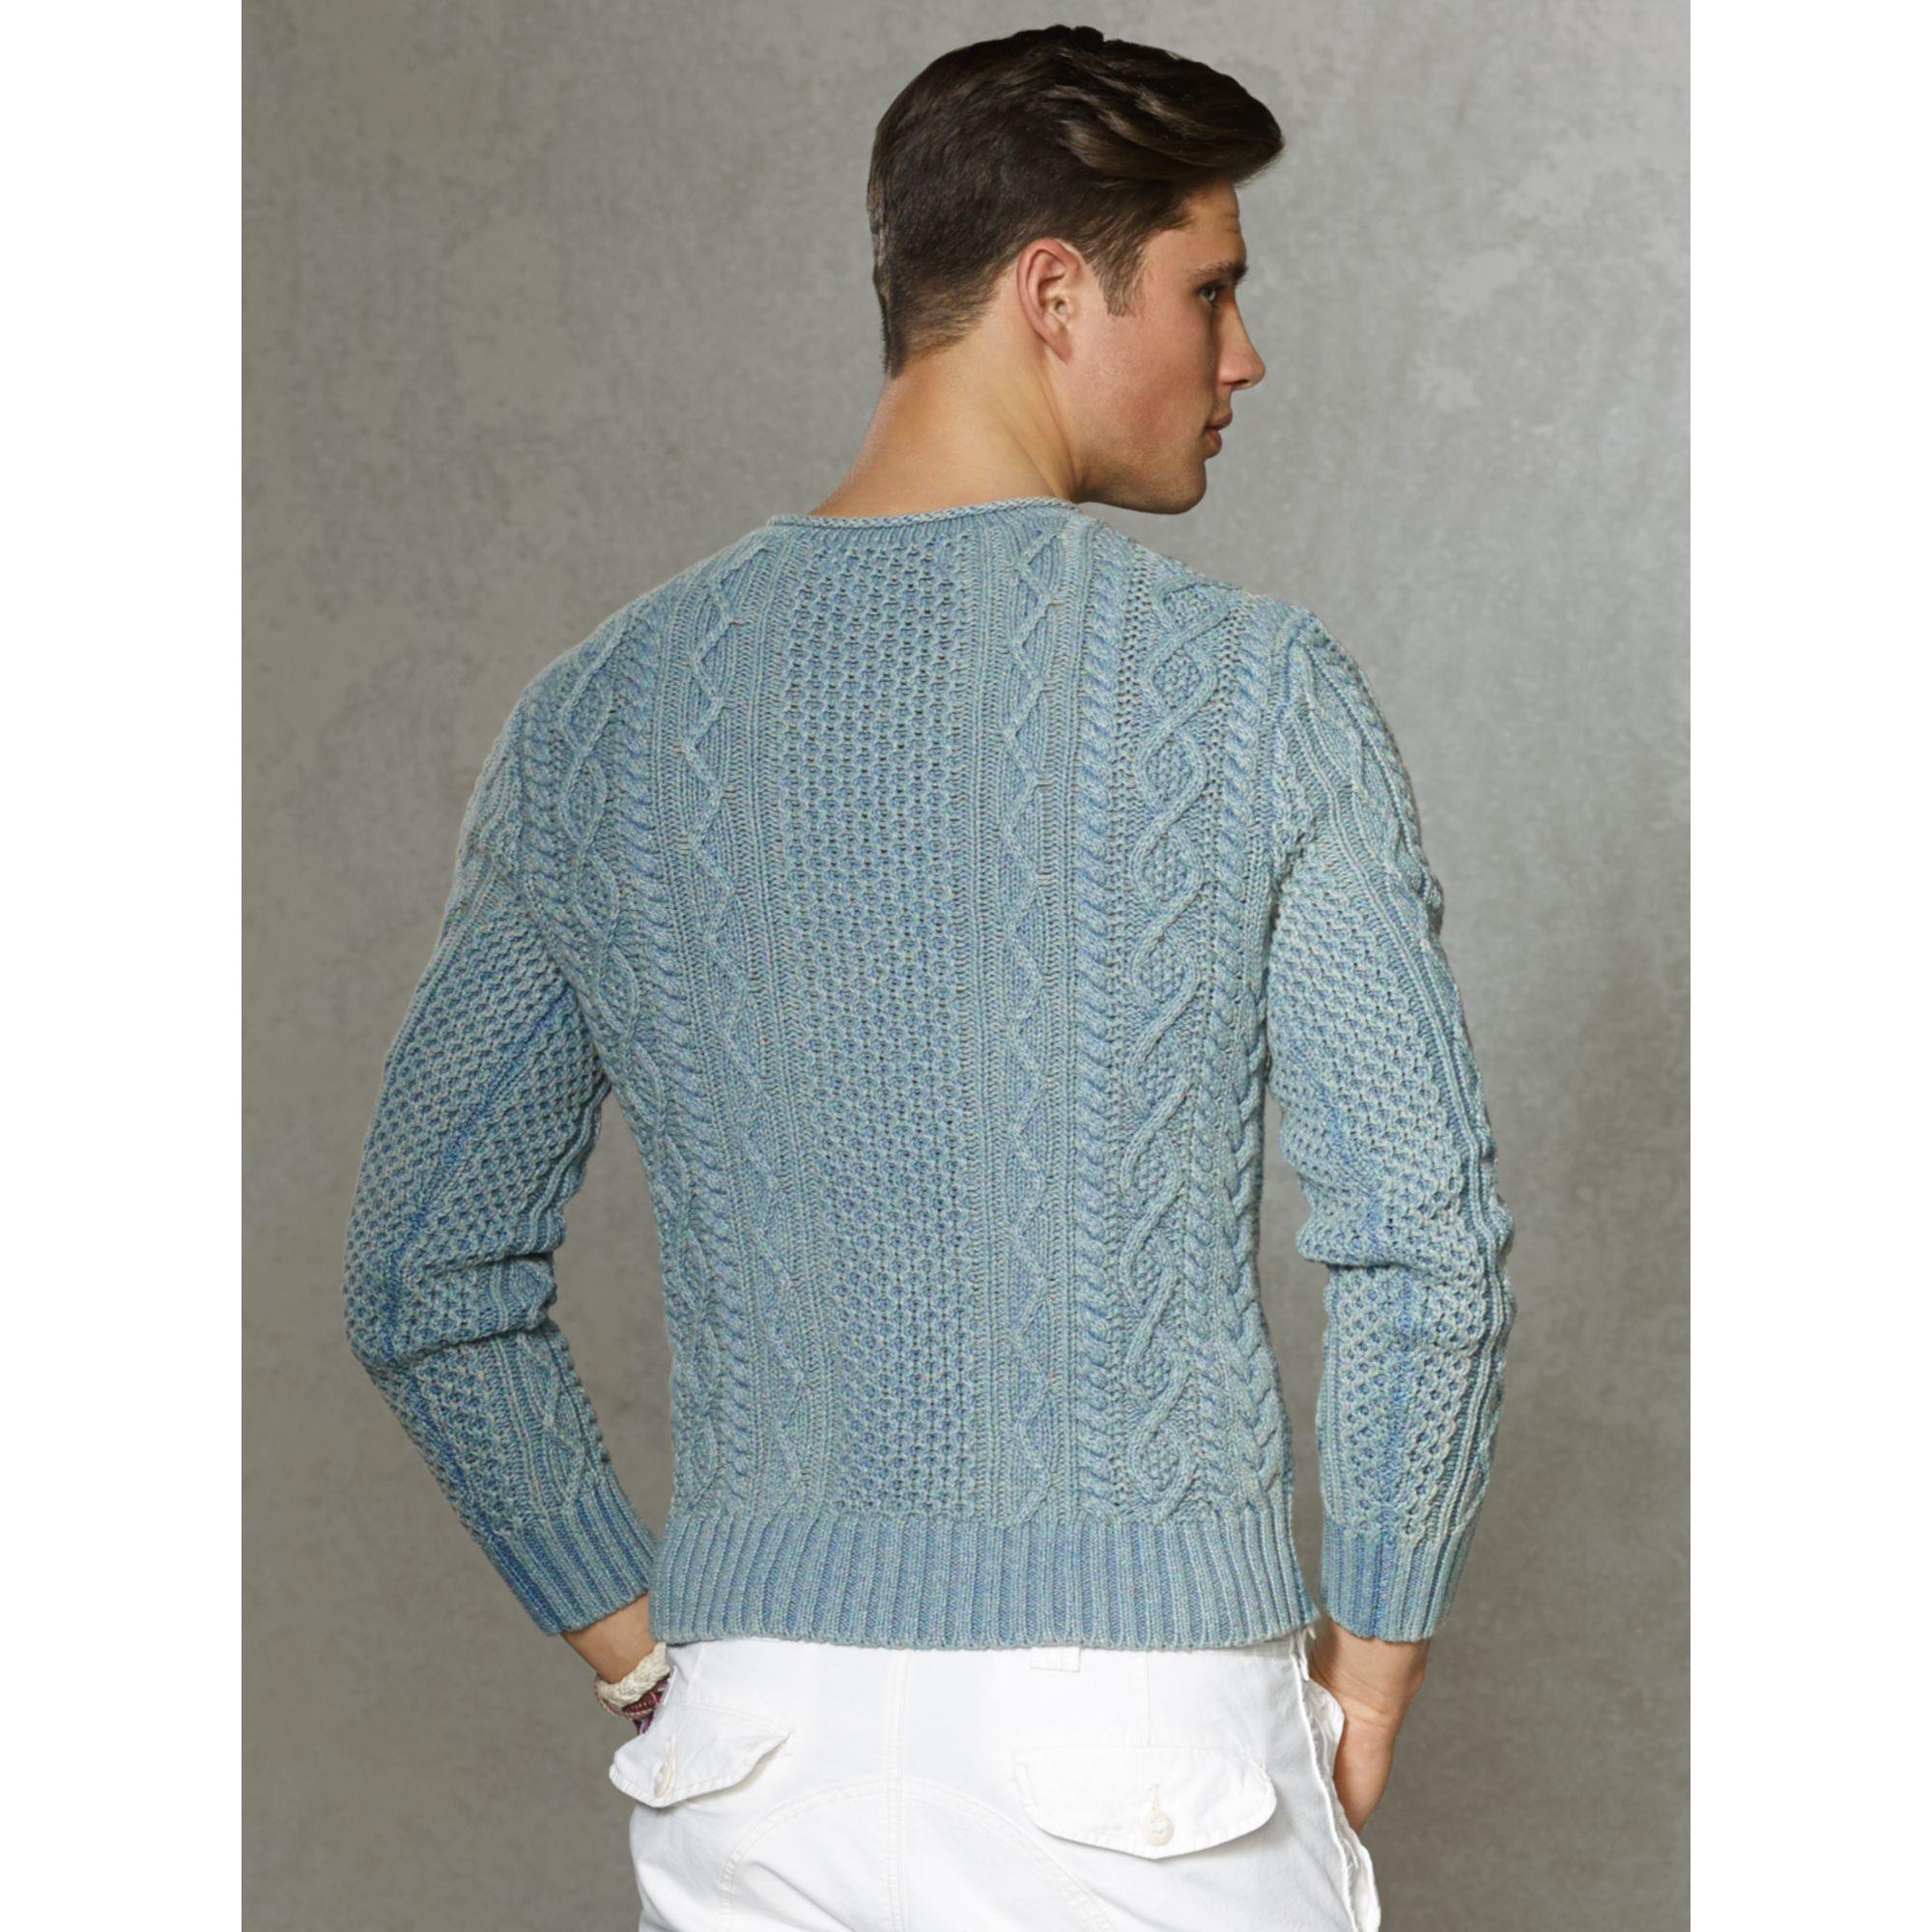 d79eac823eb ... cheap lyst polo ralph lauren indigo aran roll neck sweater in blue for  men a1f9f 8ef94